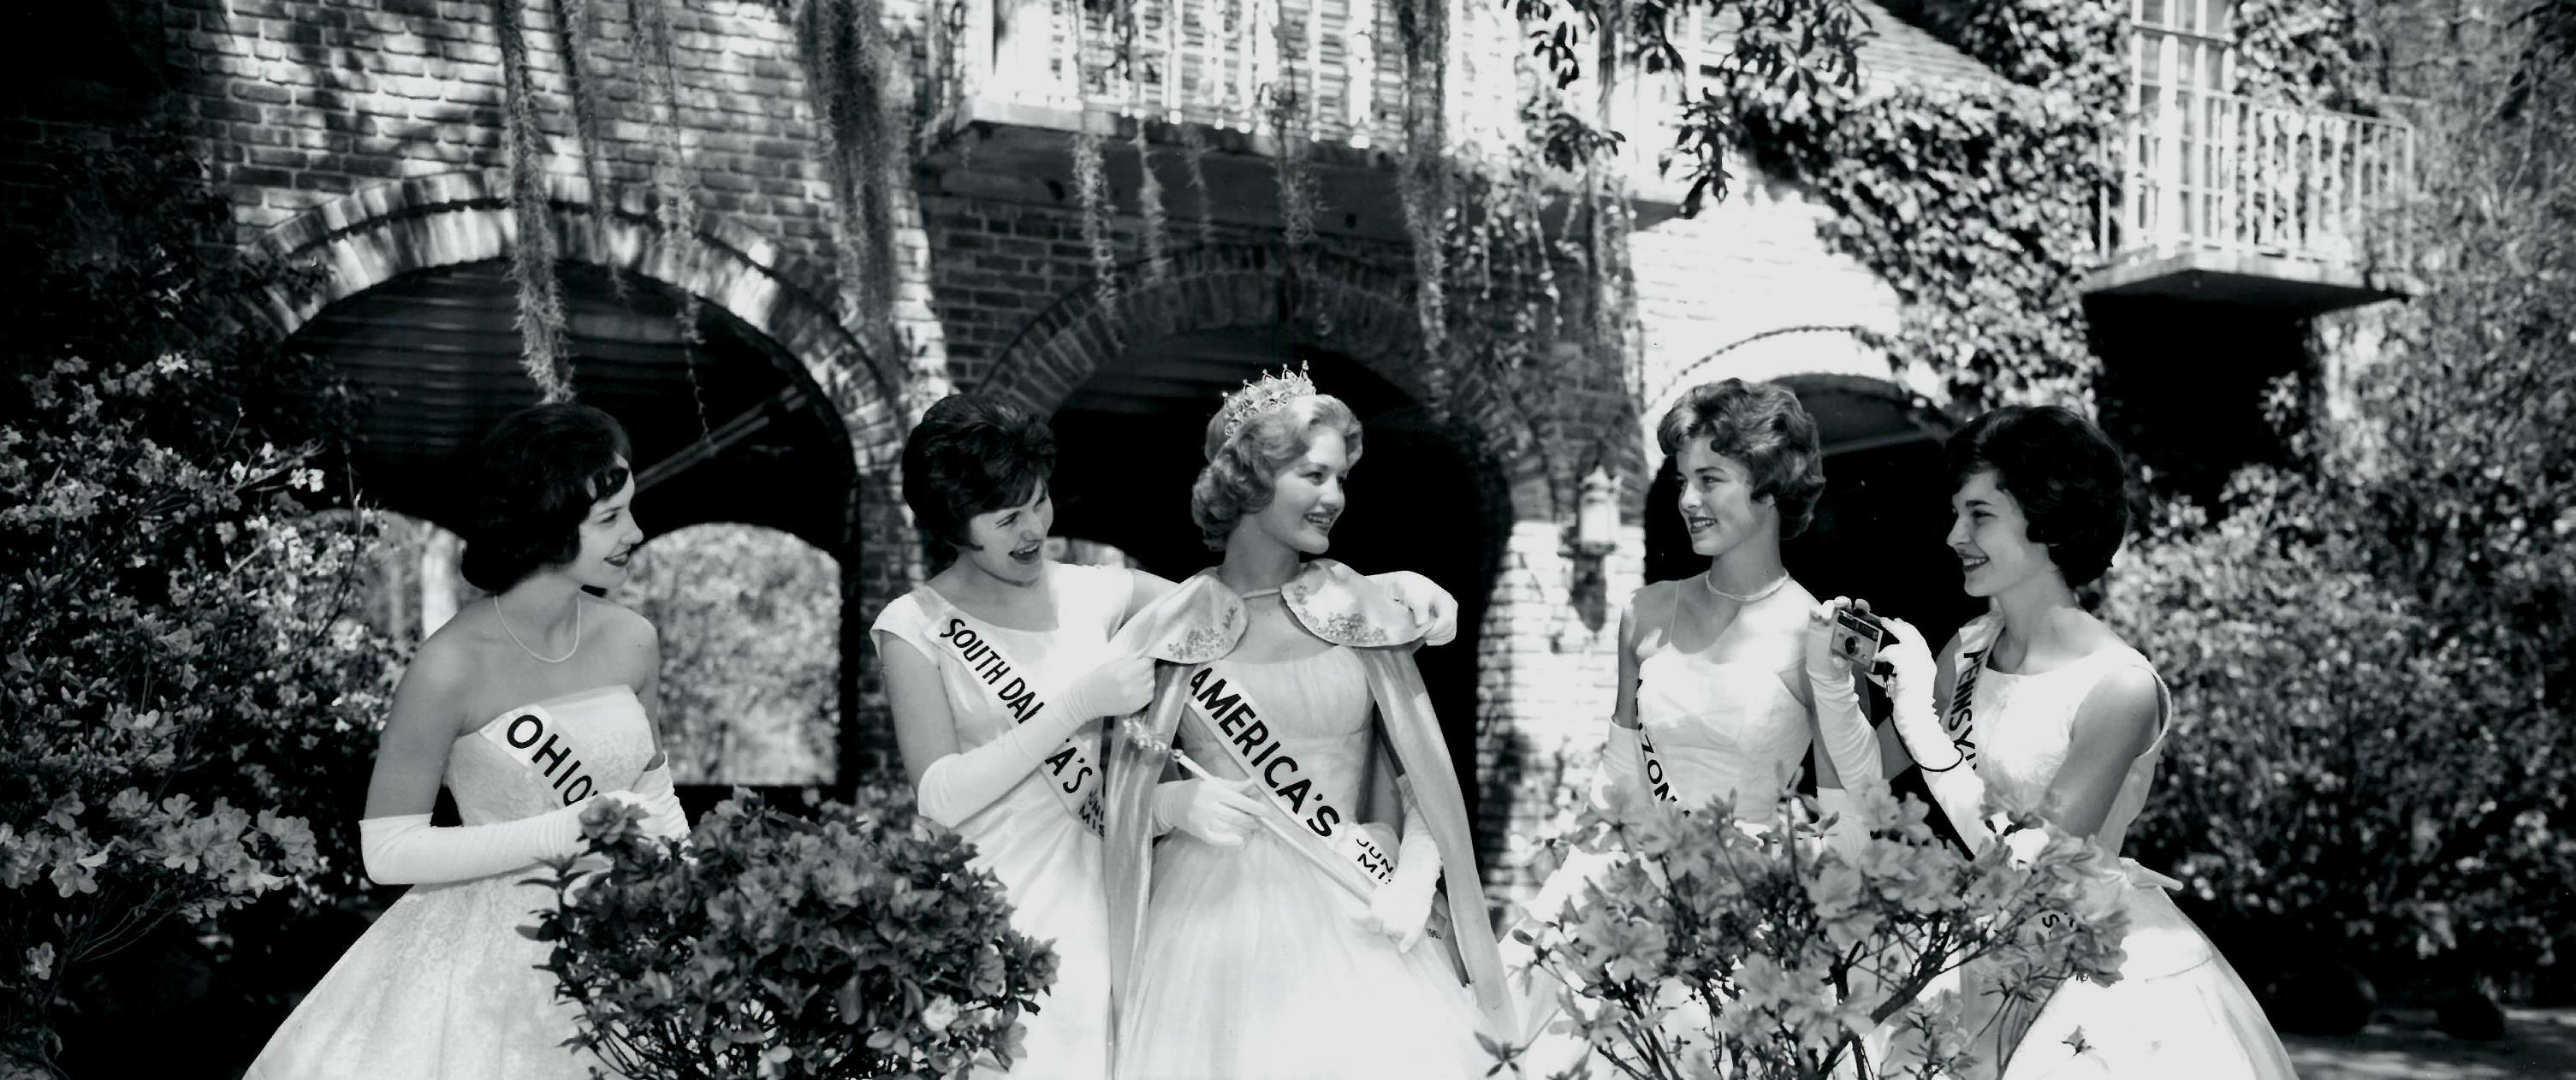 Diane Sawyer, America's Junior Miss 1963, Visits